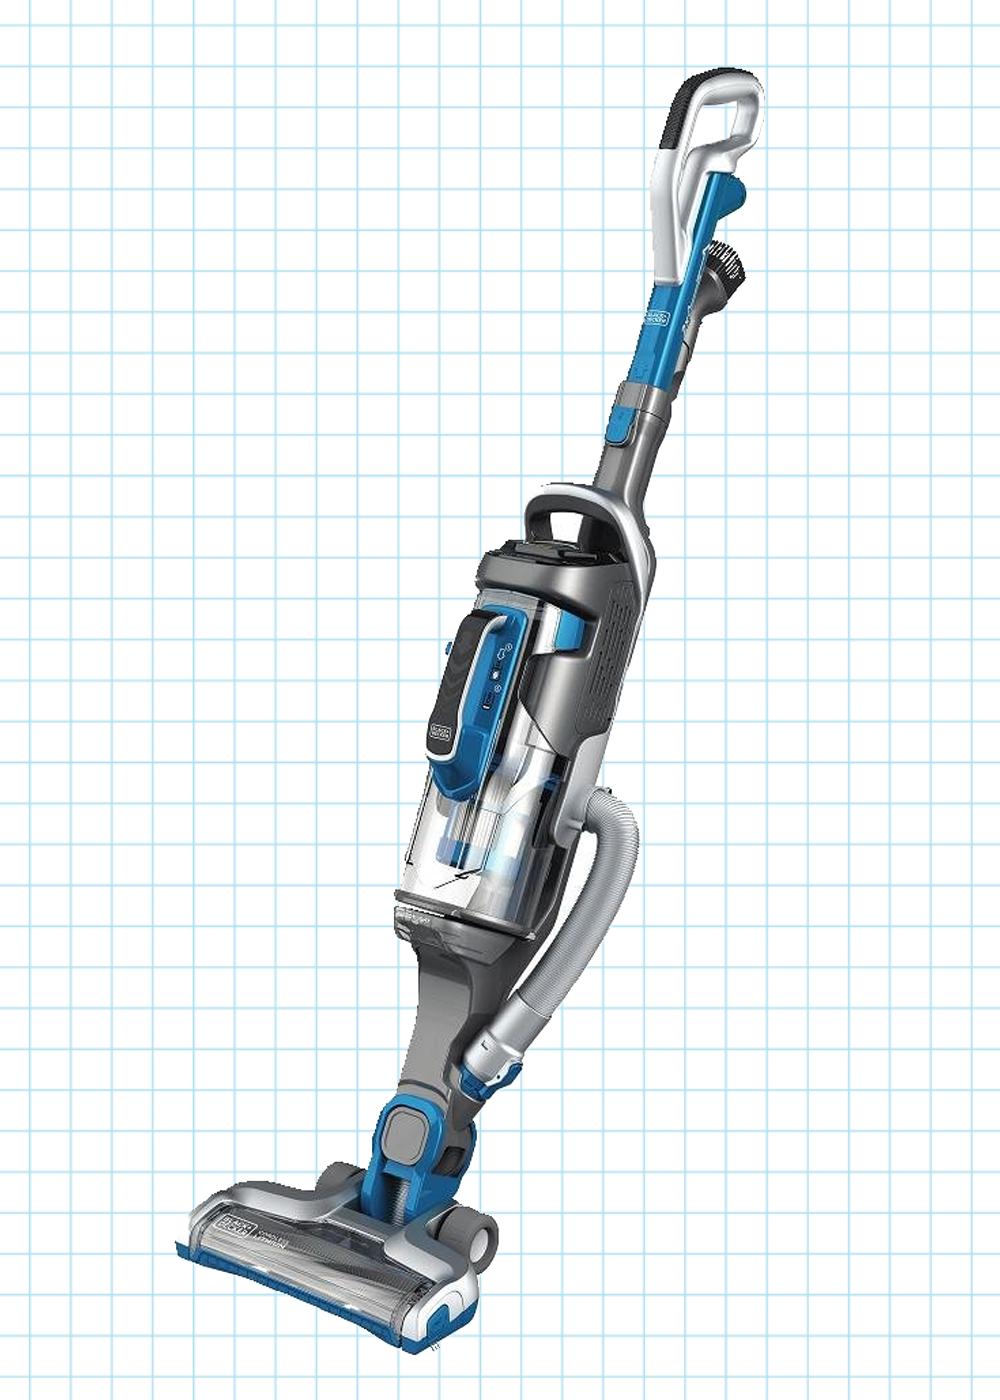 Black + Decker Powerseries Pro 2-in-1 Cordless Vacuum